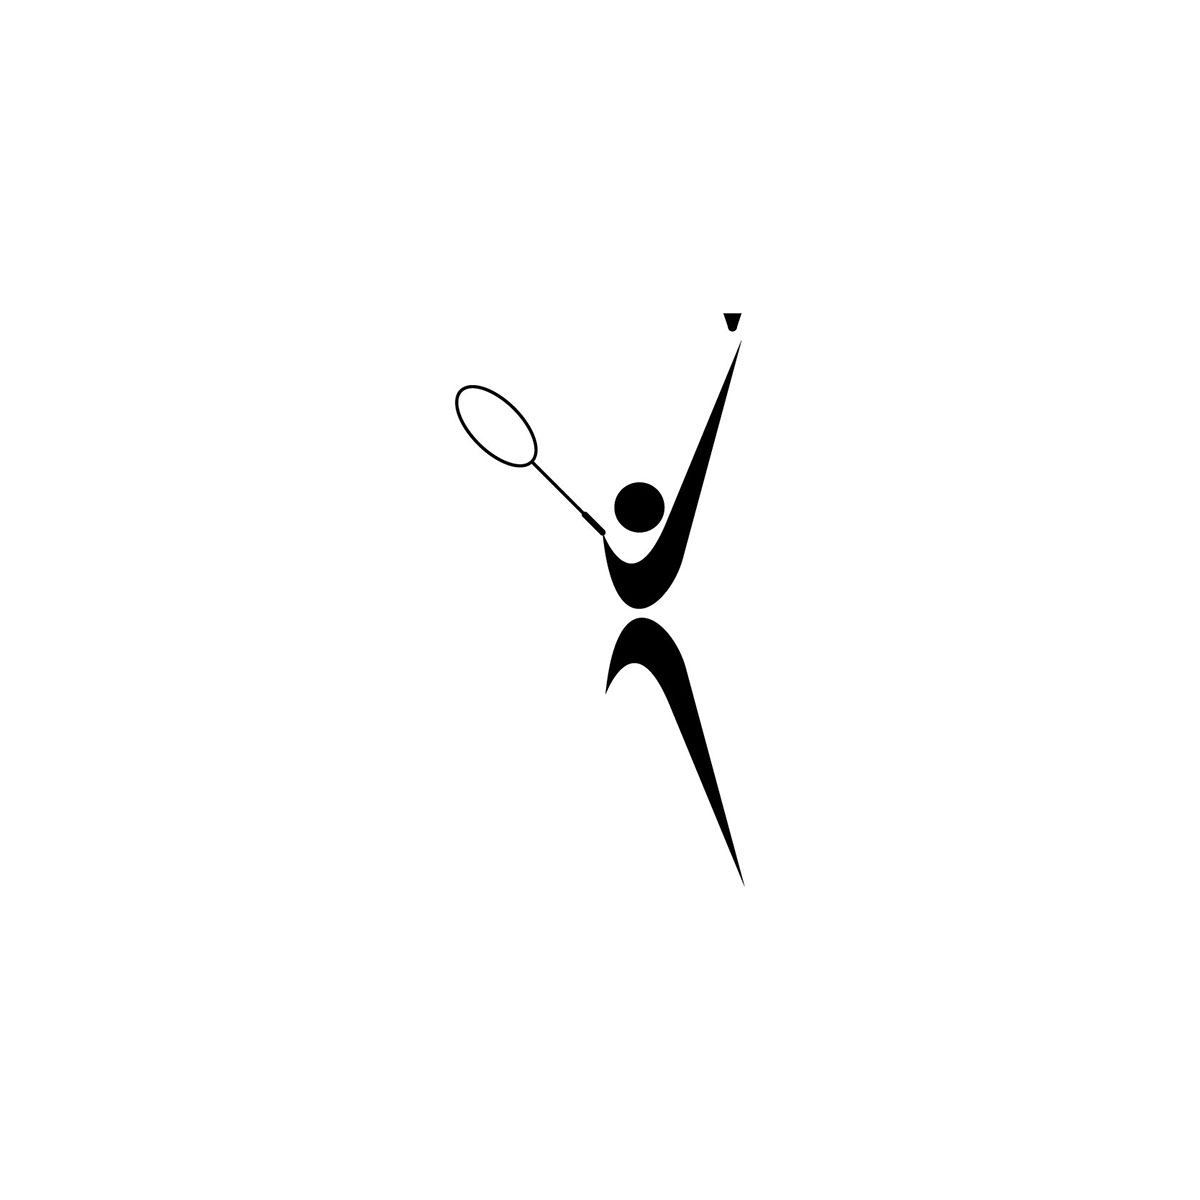 Nike Olympic Games pictograms London 2012 OLIMPIADI pittogrammi OLIMPIADI 2012 Olympic Games 2012 logo MARCHIO NIKE marchio brand sports Games NIKE BRAND